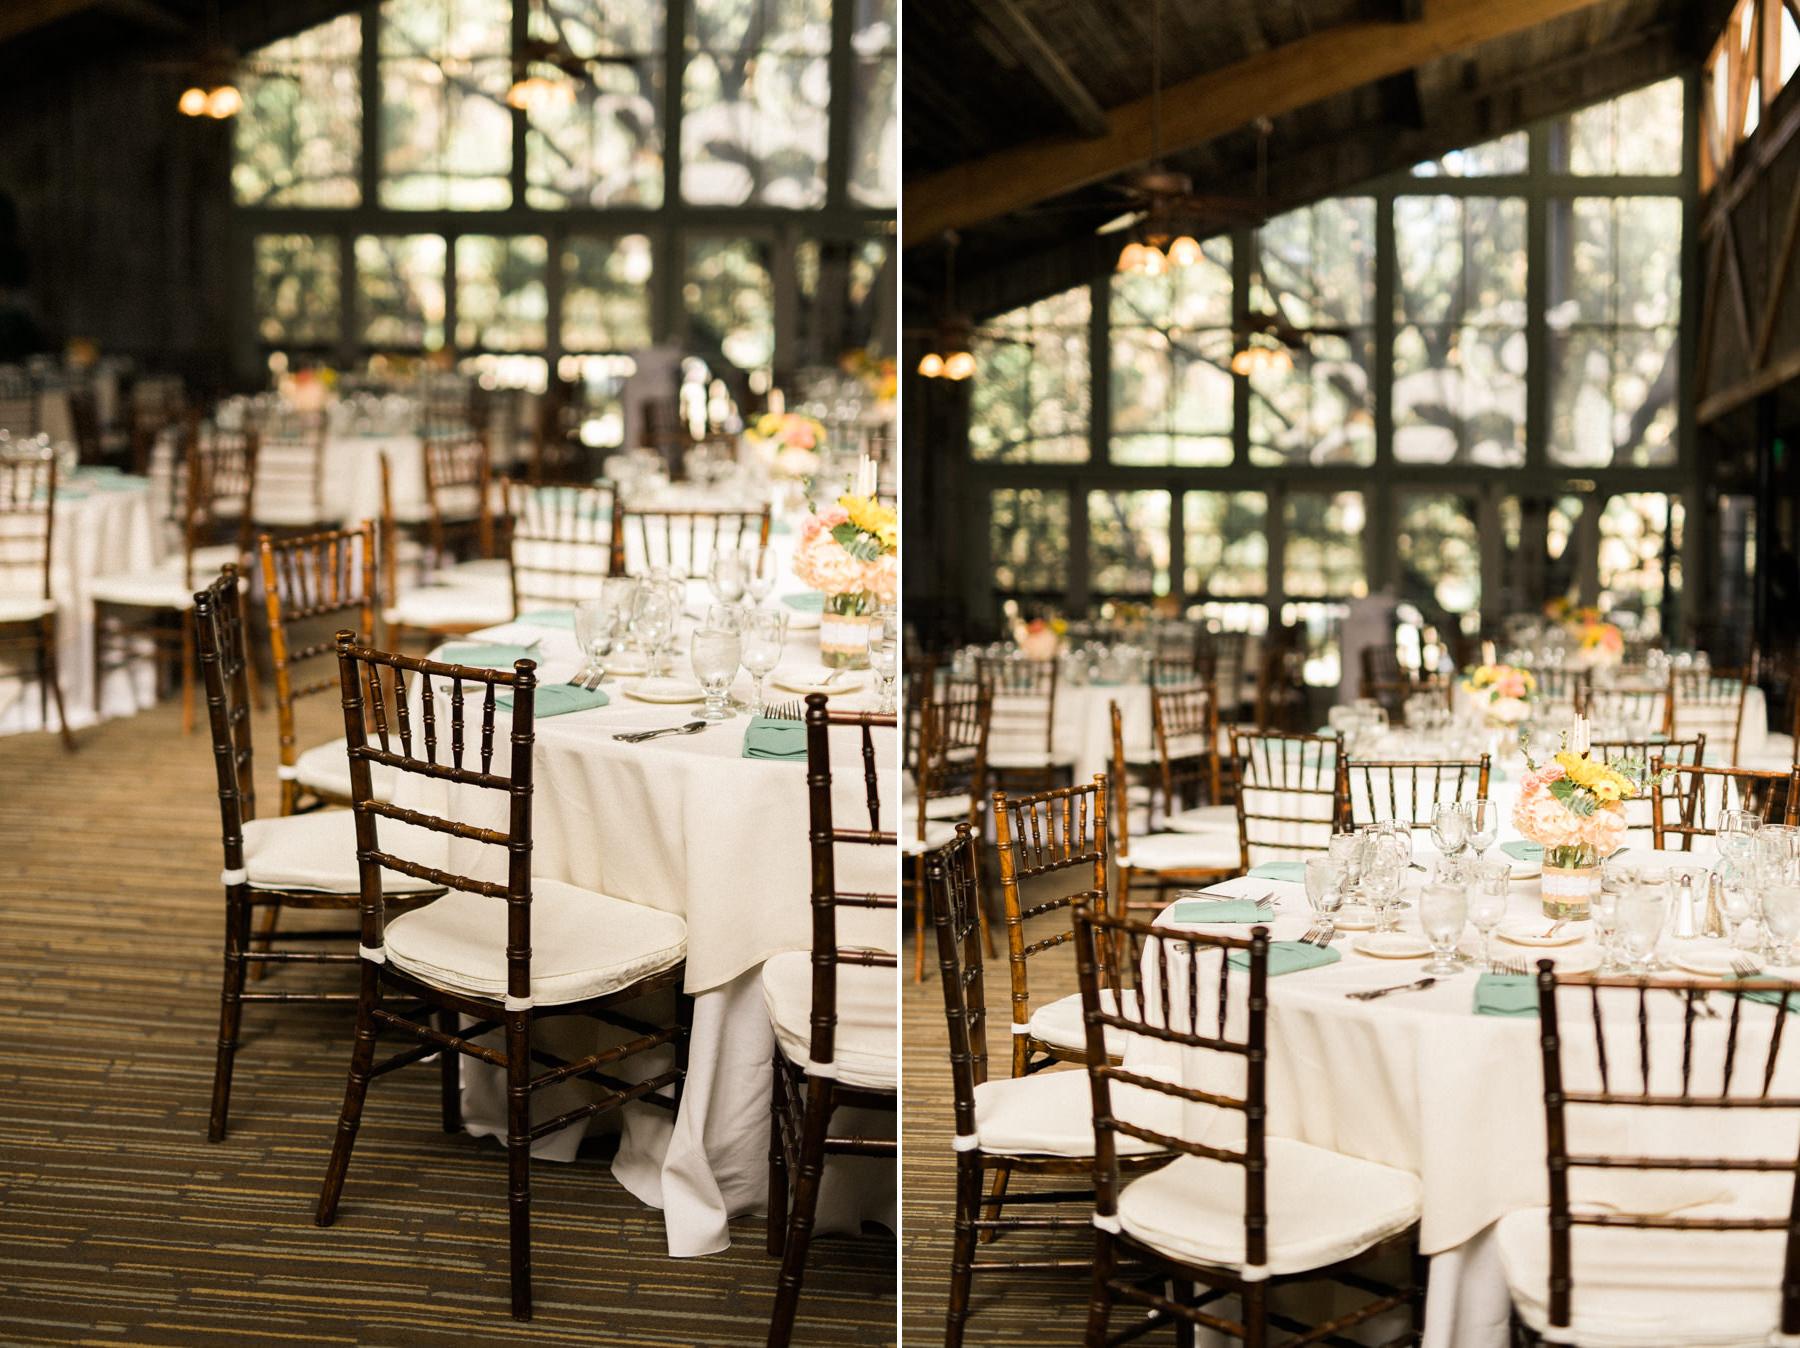 Calamigos Ranch Redwood Room wedding 022.jpg